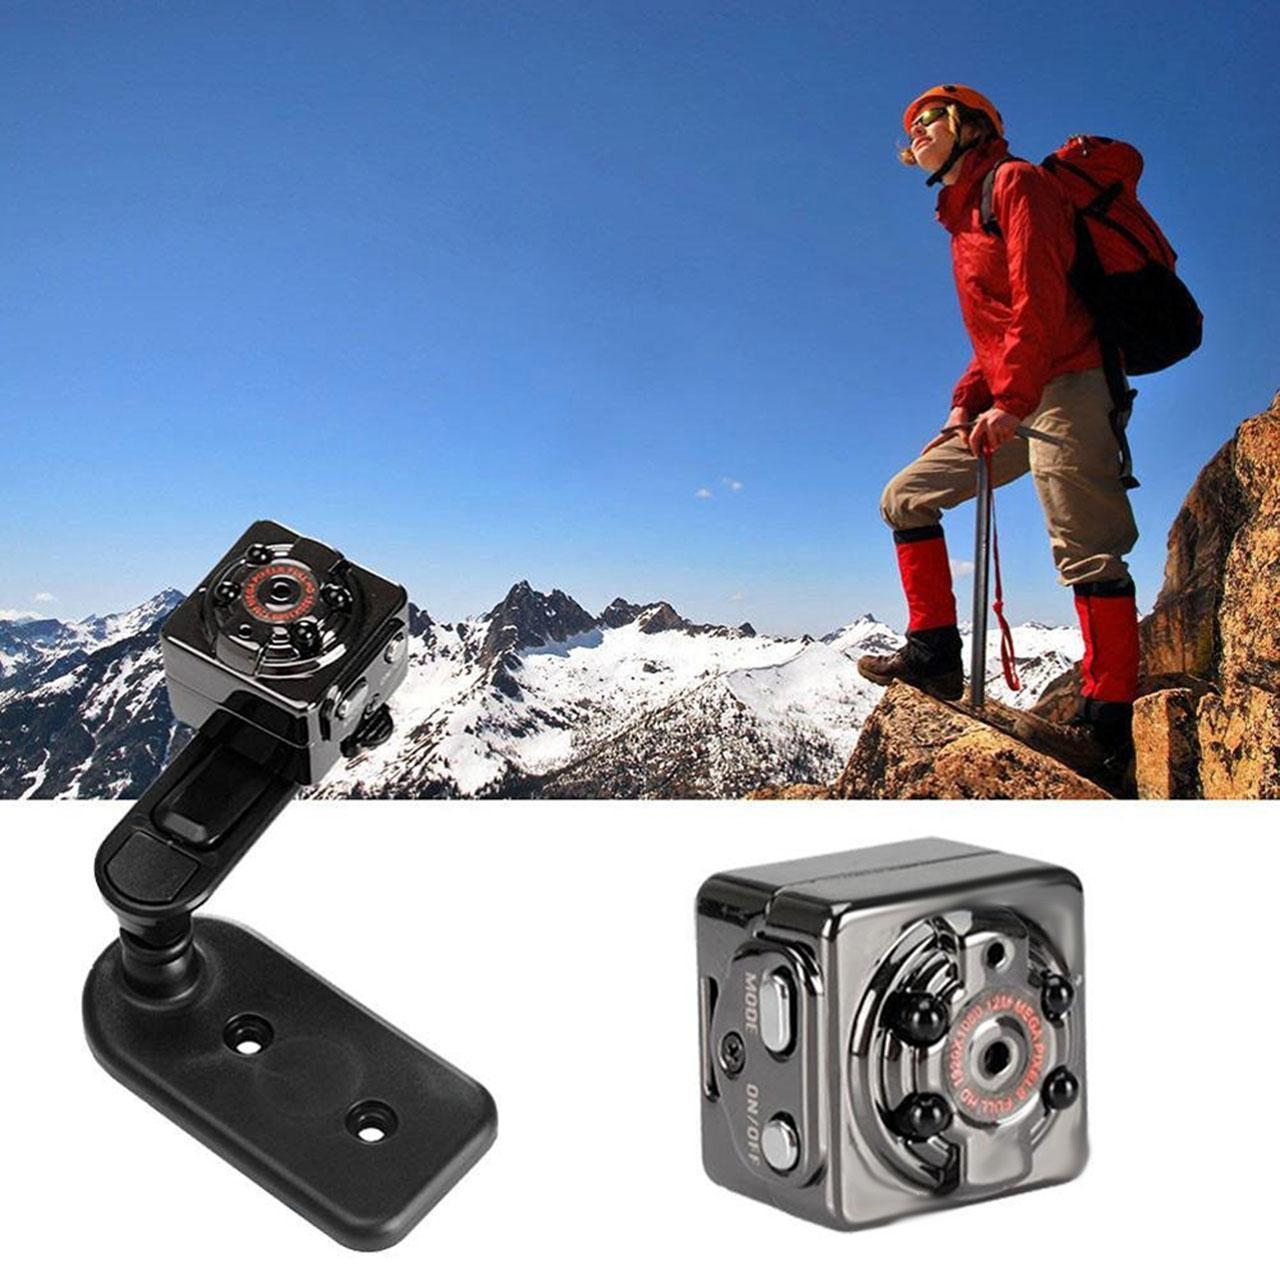 32G Card+High Definition SQ8 MINI Camera TF Card Voice Recorder Night Vision DV Car DVR32G Card+High Definition SQ8 MINI Camera TF Card Voice Recorder Night Vision DV Car DVR